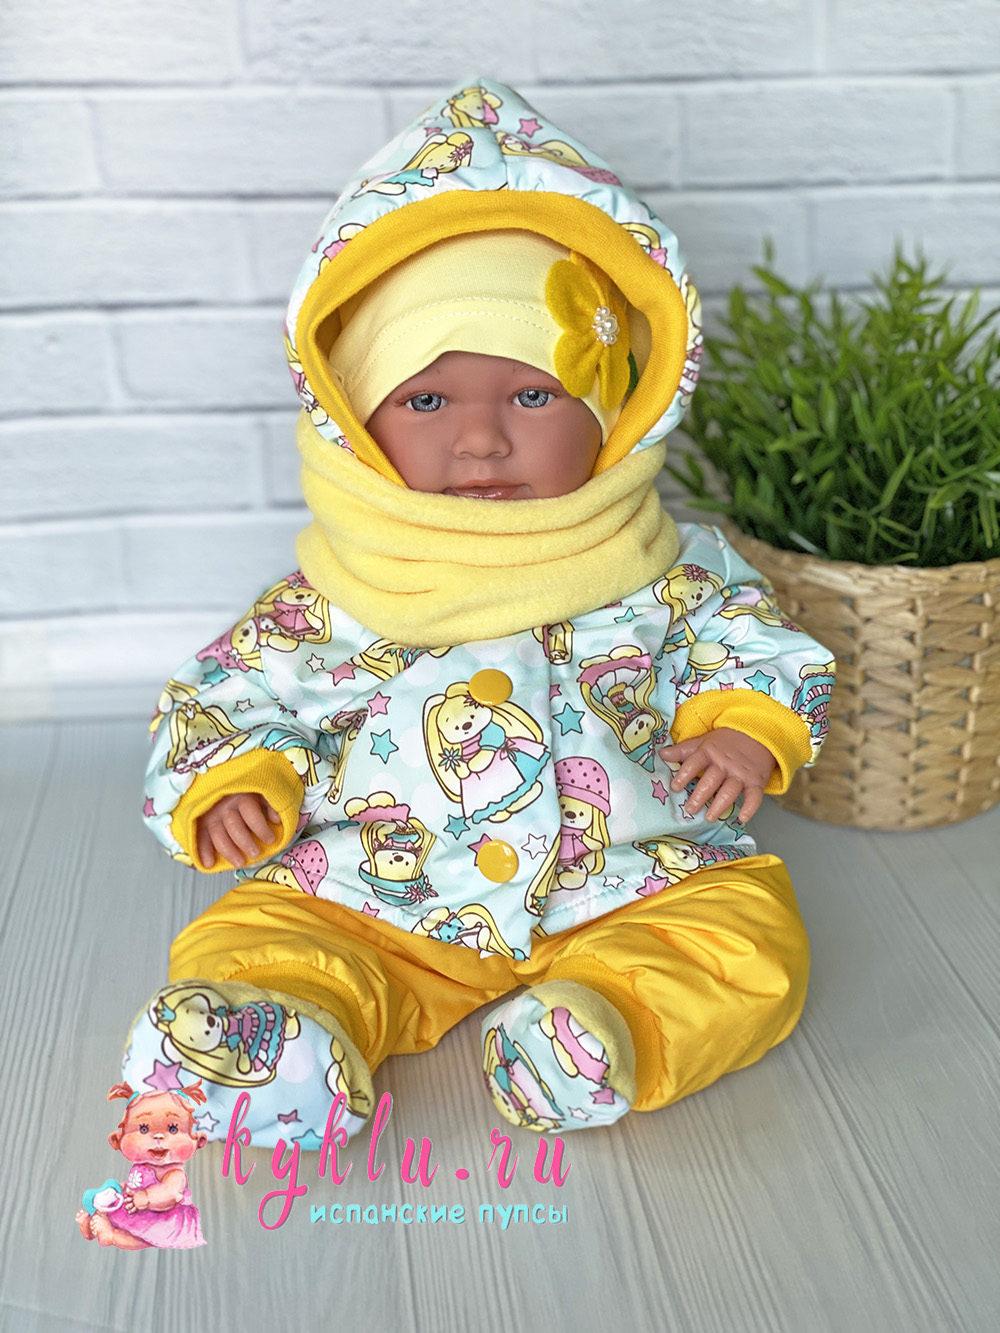 Теплый костюм на куклу желтого цвета